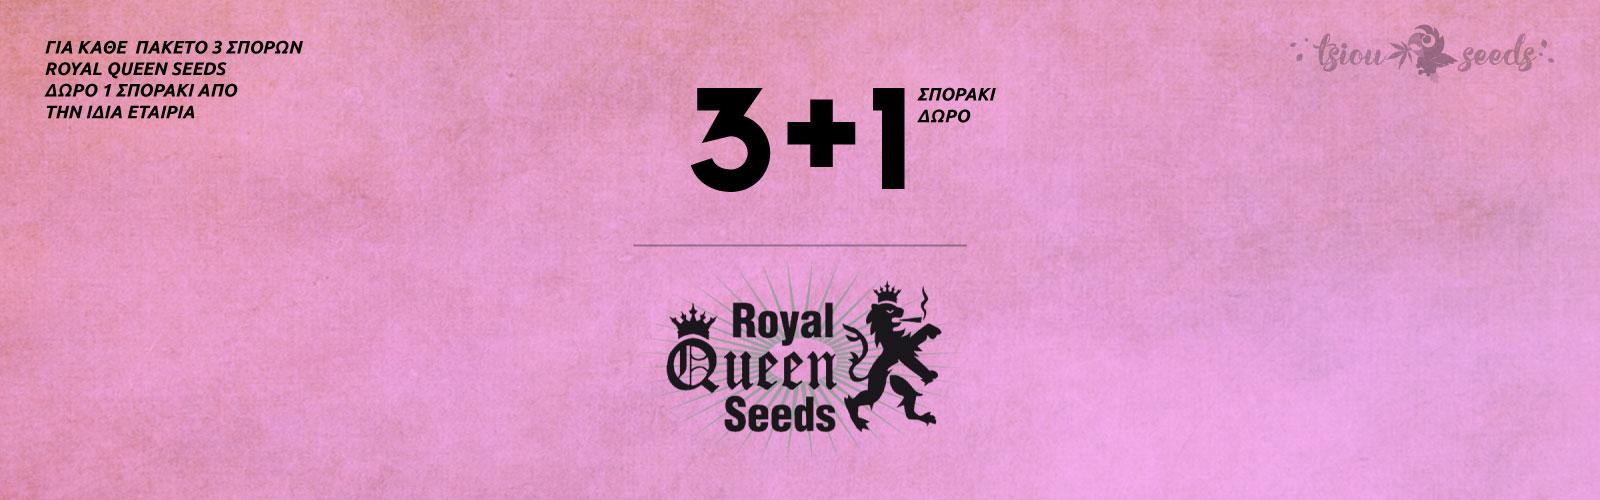 Royal-Queen-Seeds-Offer